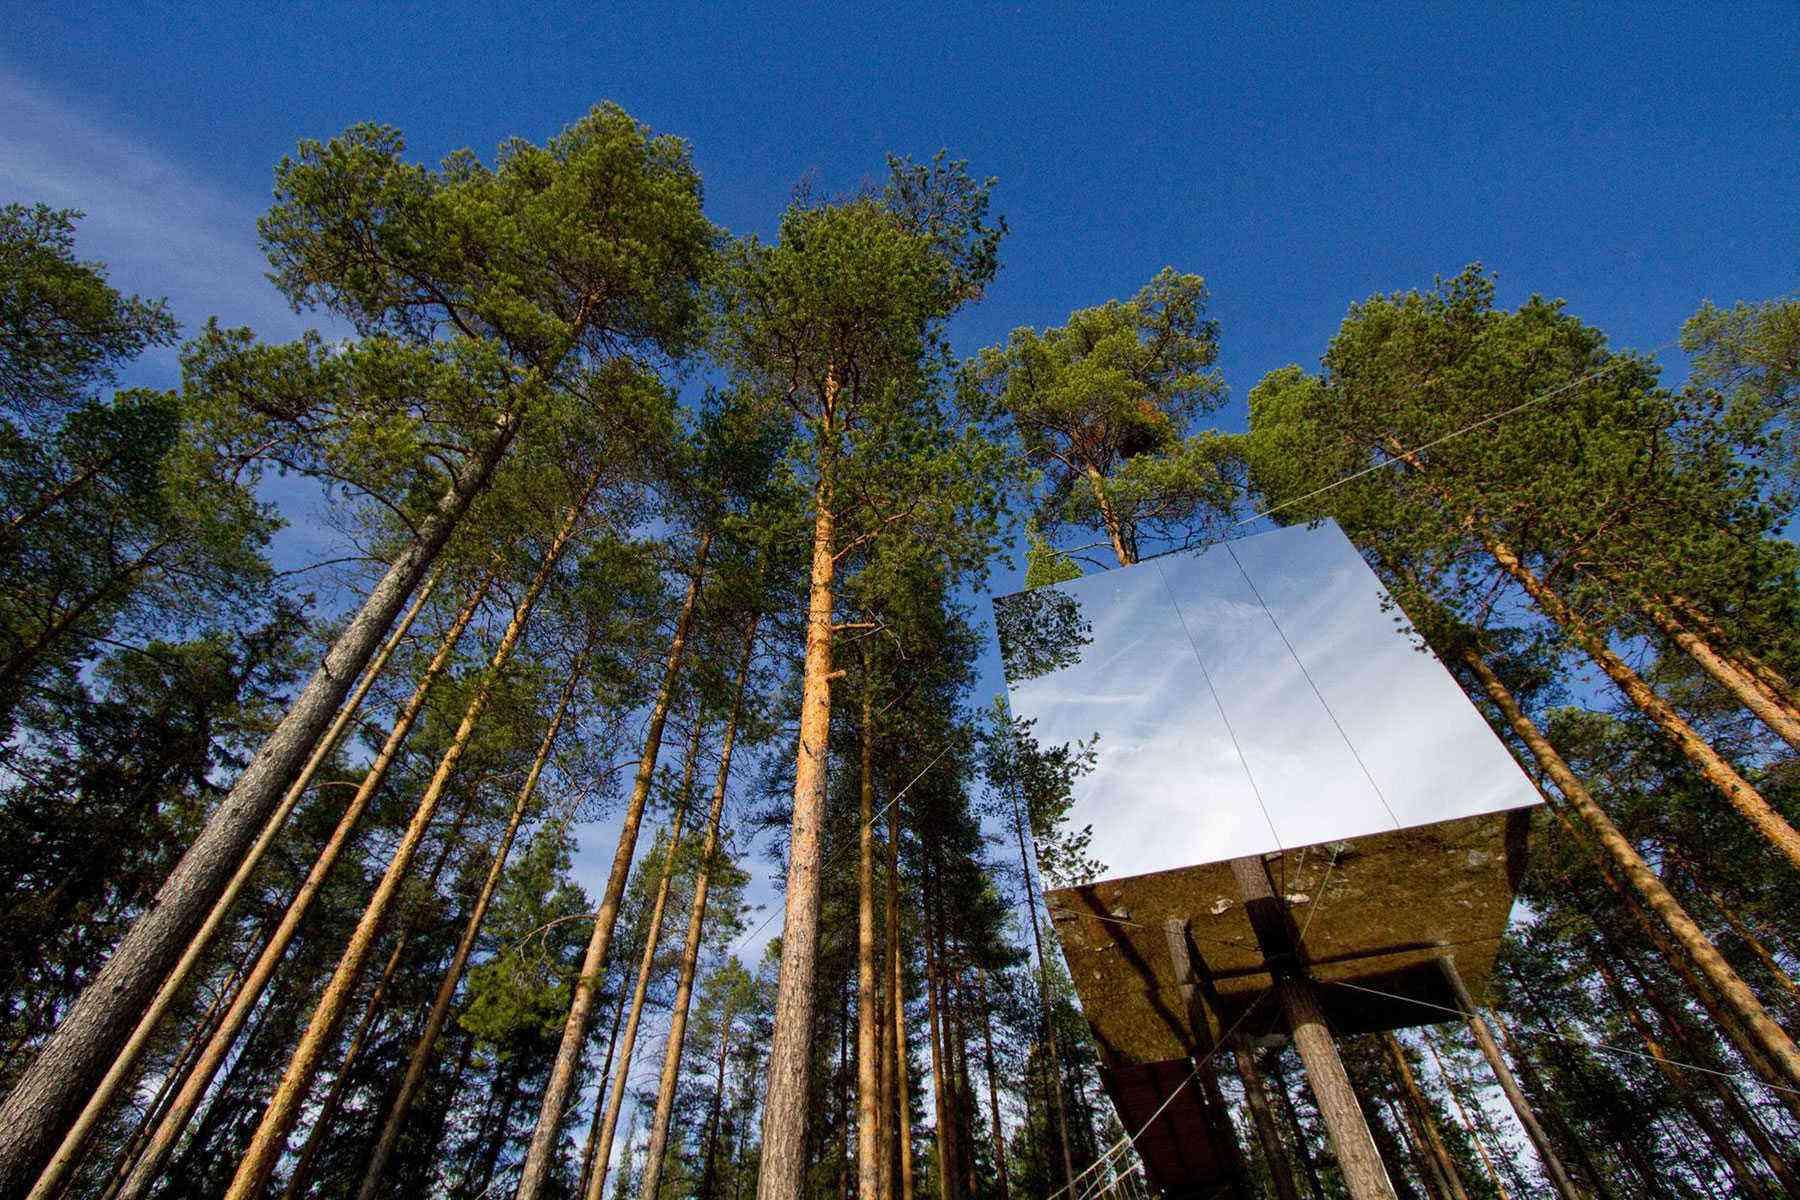 Unusual-Treehouses-Mirrorcube-1